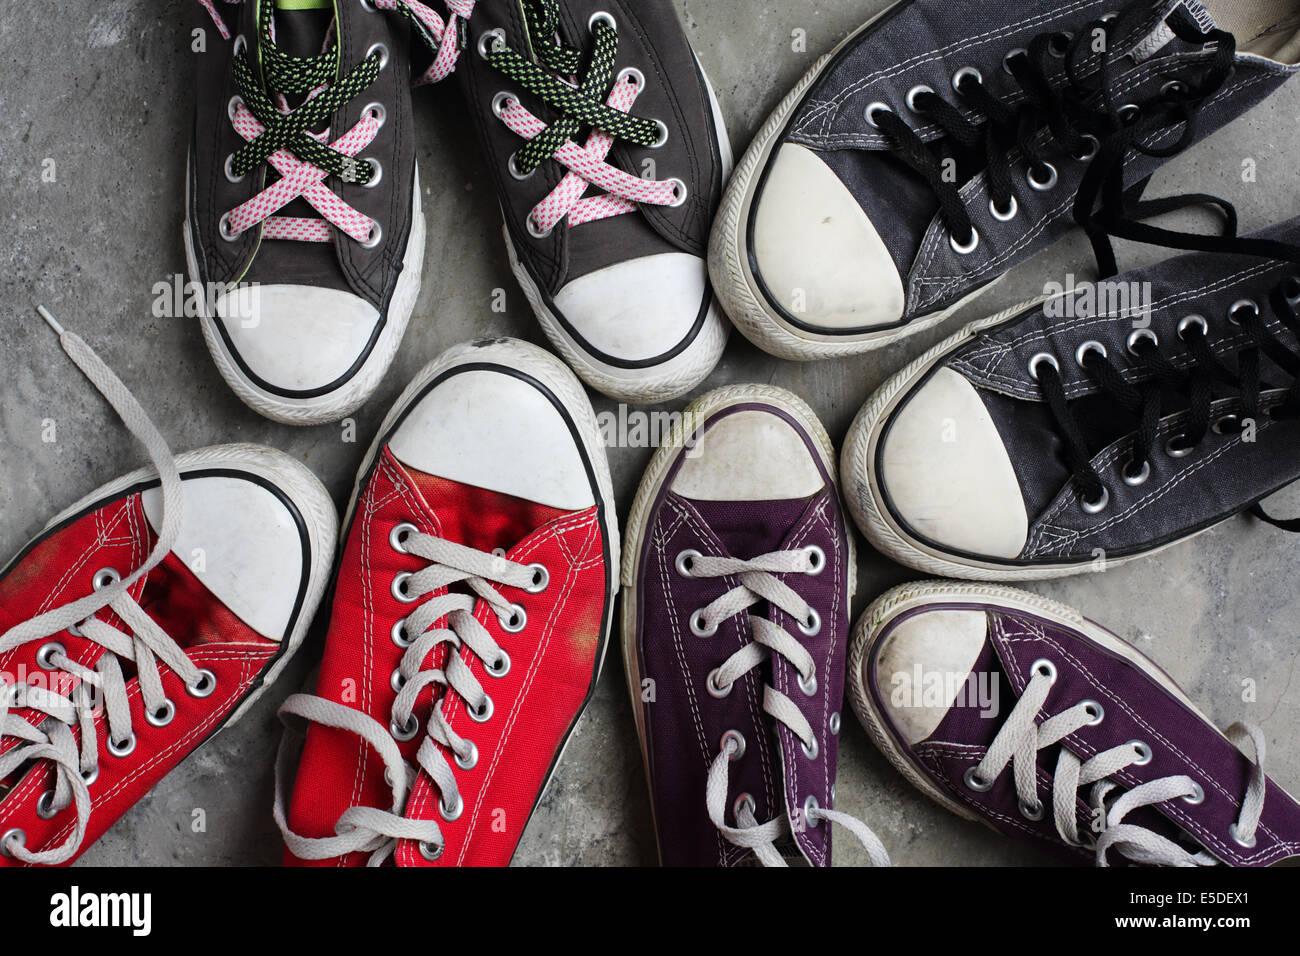 Converse Shoes Stockfotos & Converse Shoes Bilder Alamy